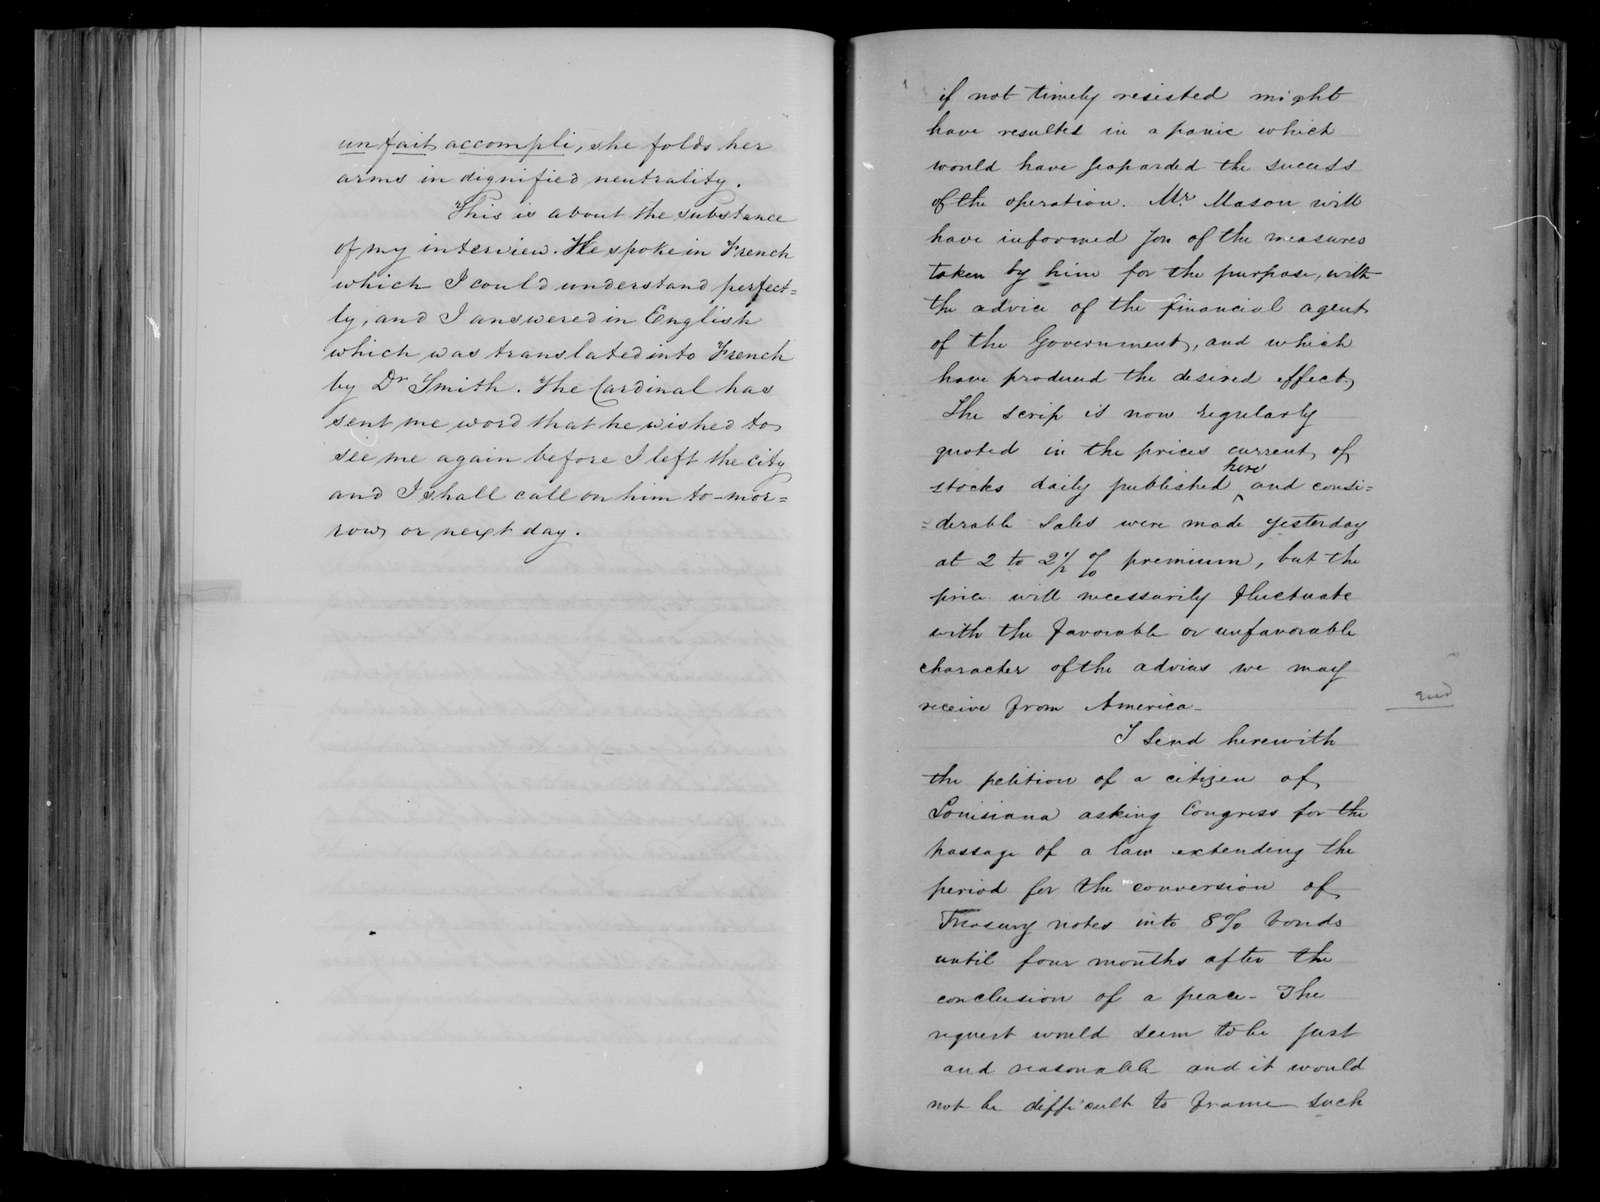 Confederate States of America records: Microfilm Reel 30